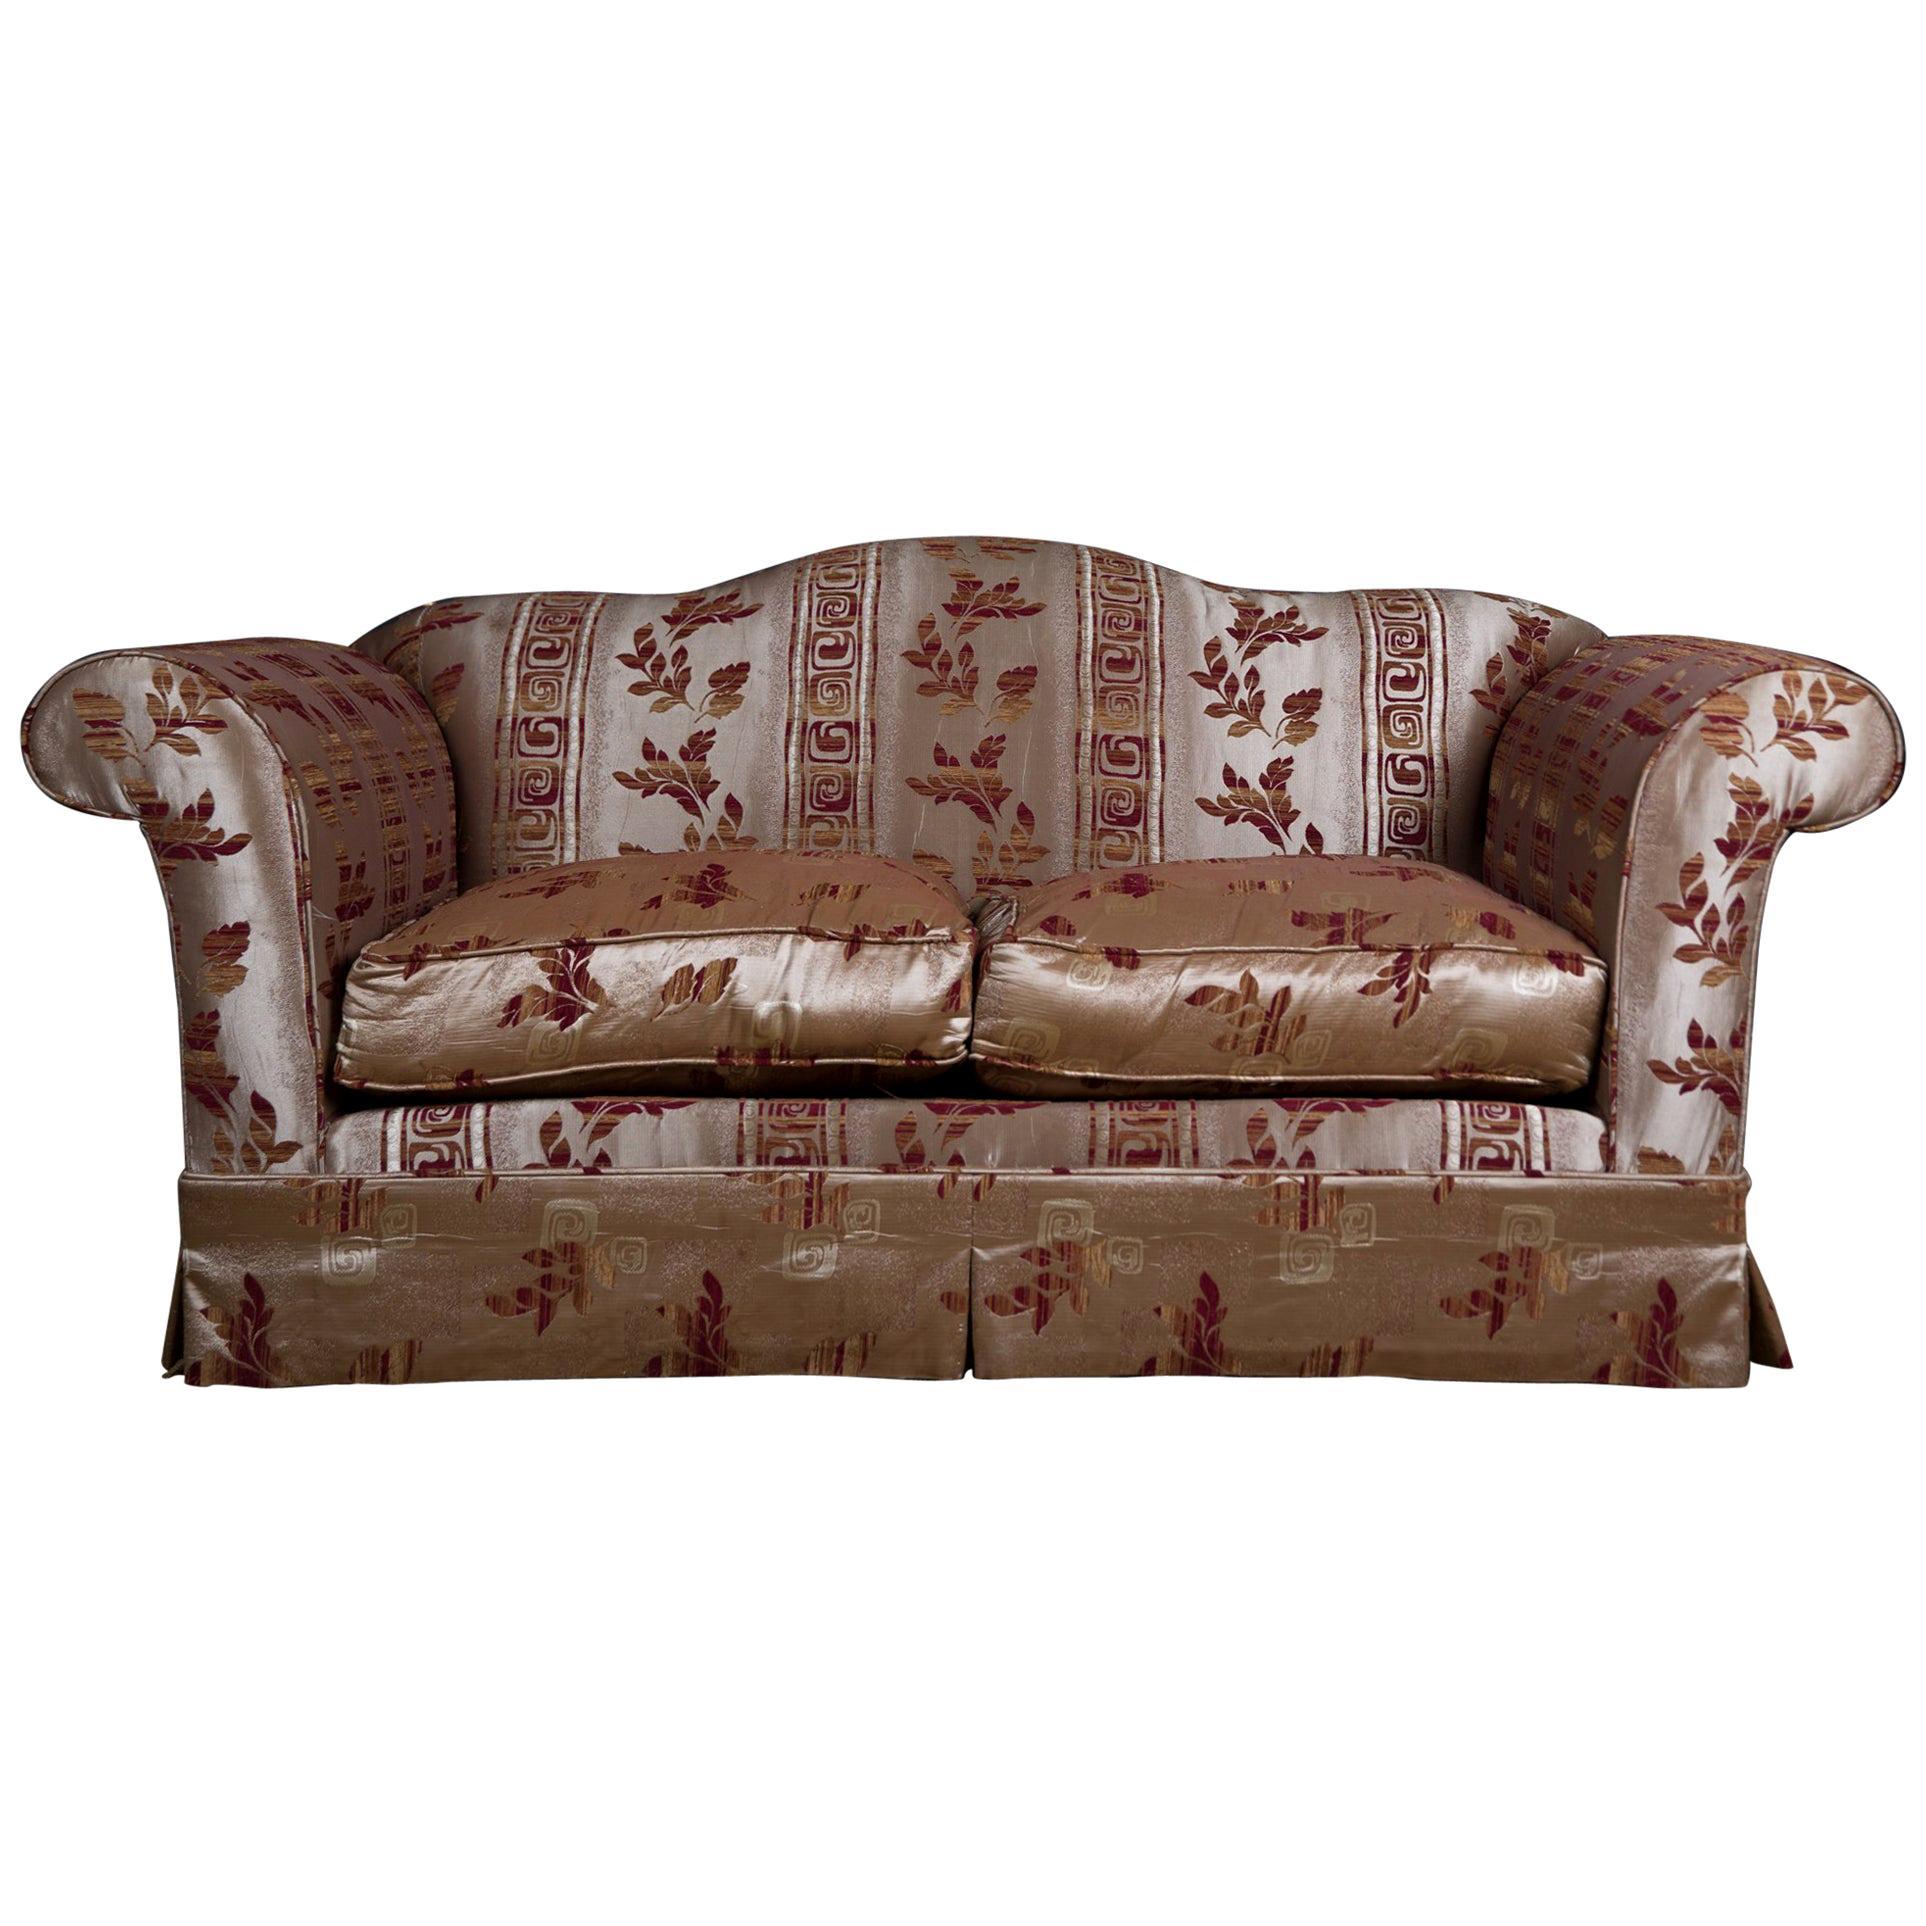 20th Century Original Club Sofa in English Style Two Seats